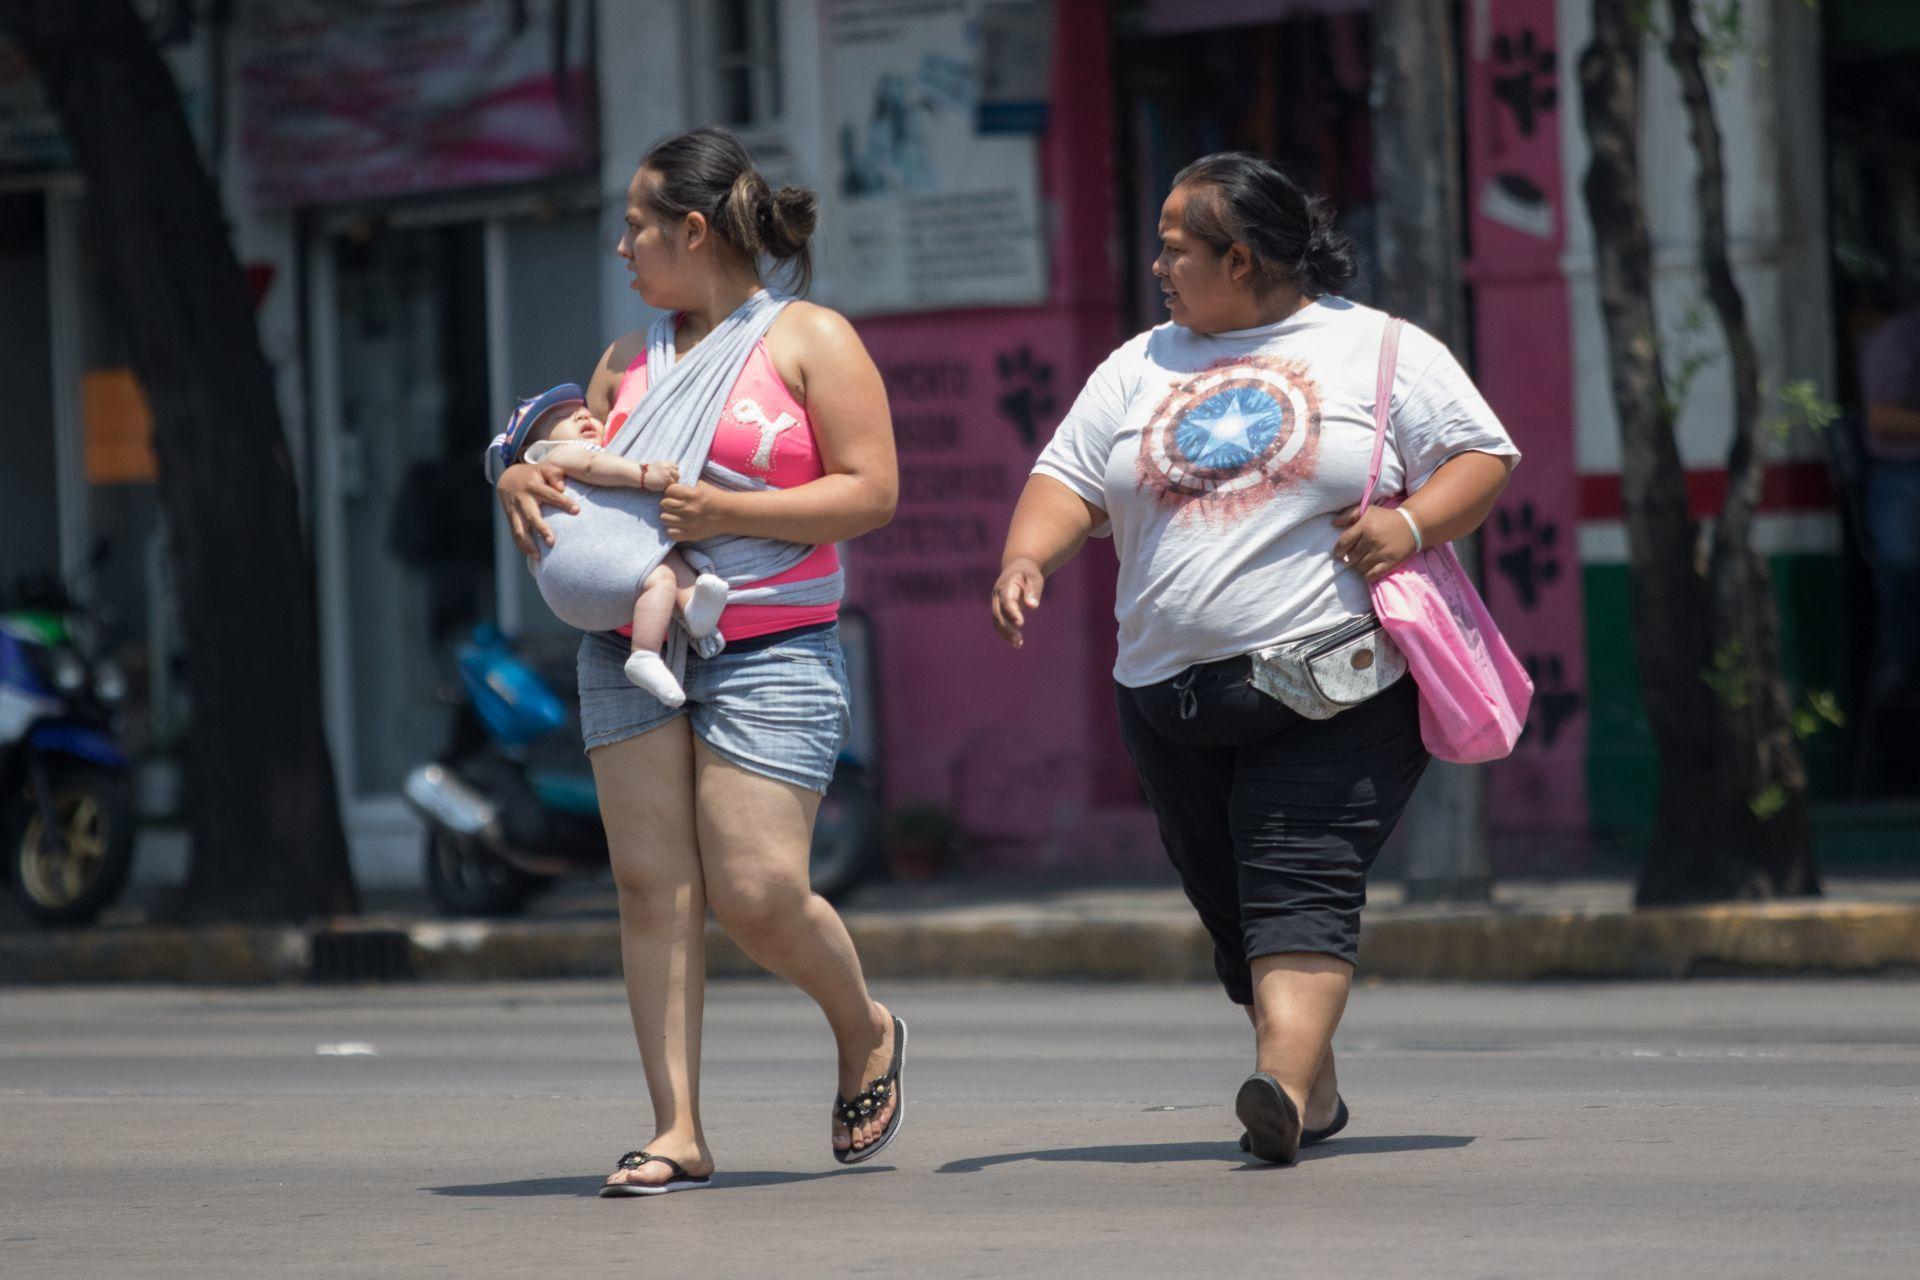 Obesidad vulnerable a coronavirus